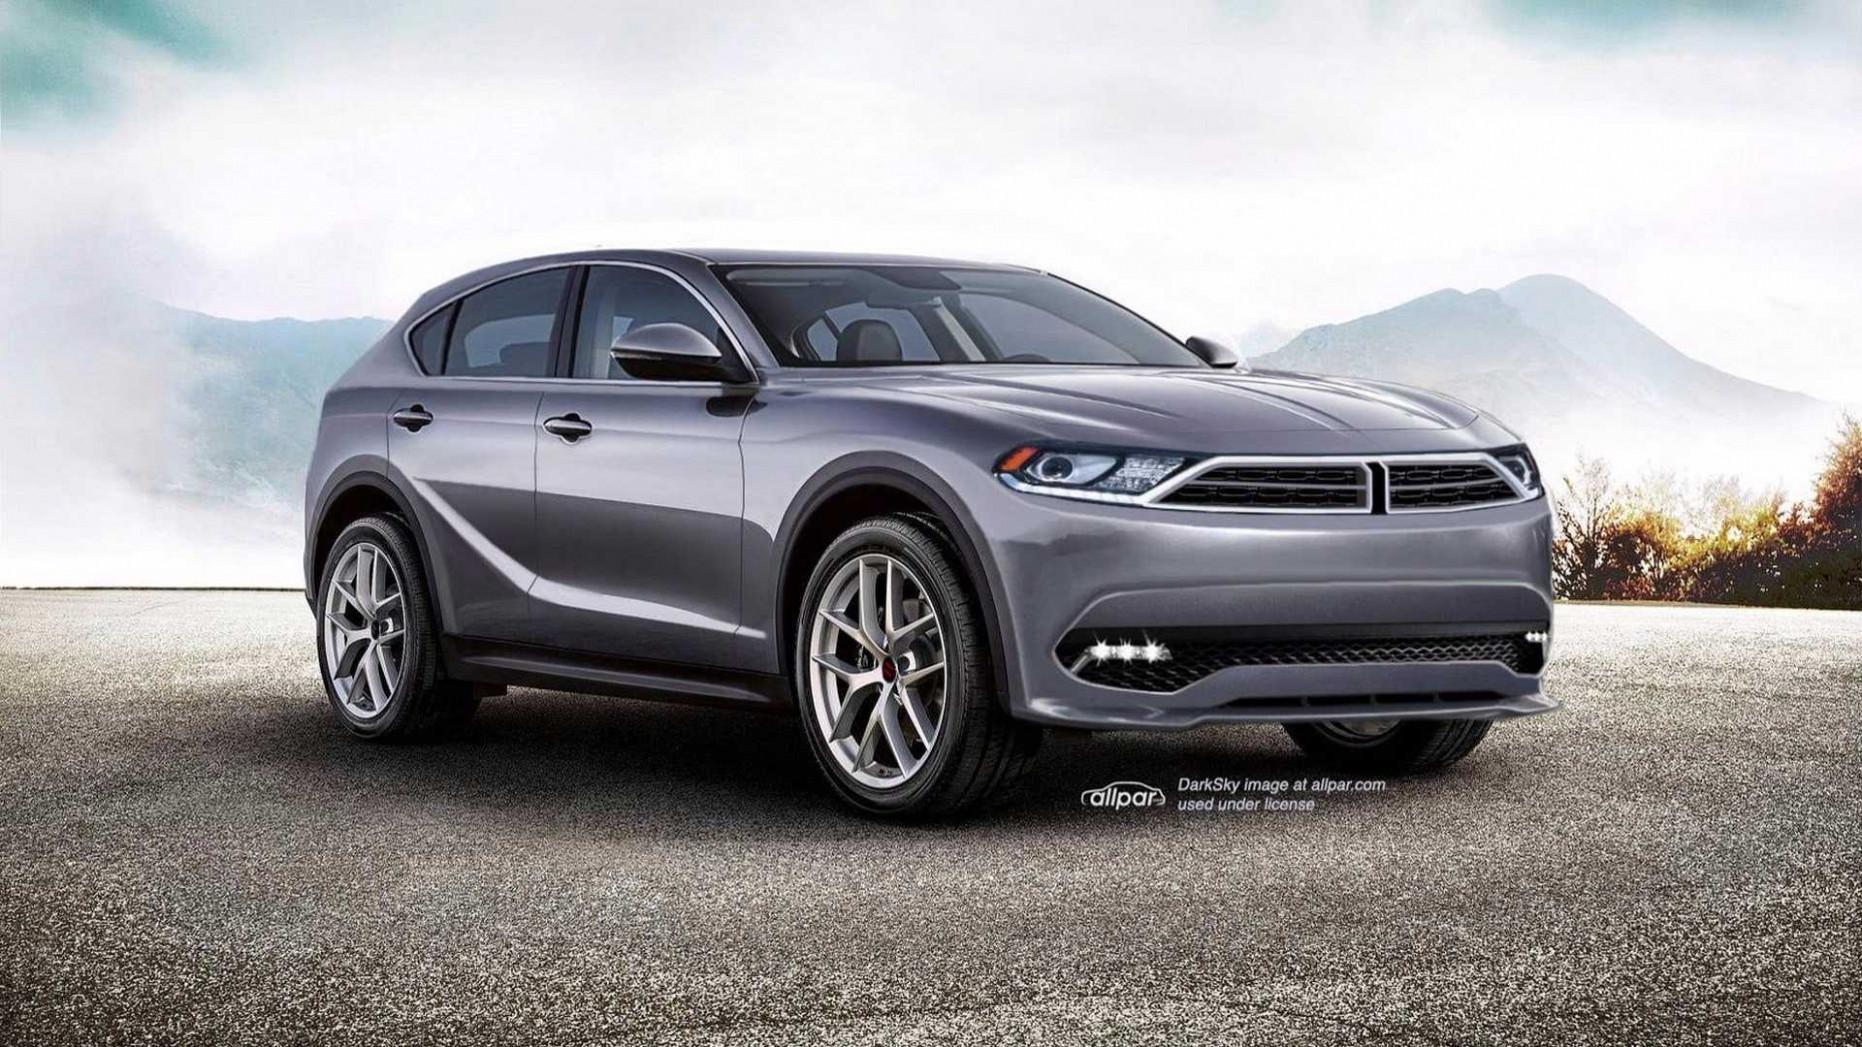 Exterior and Interior 2022 Dodge Journey Srt